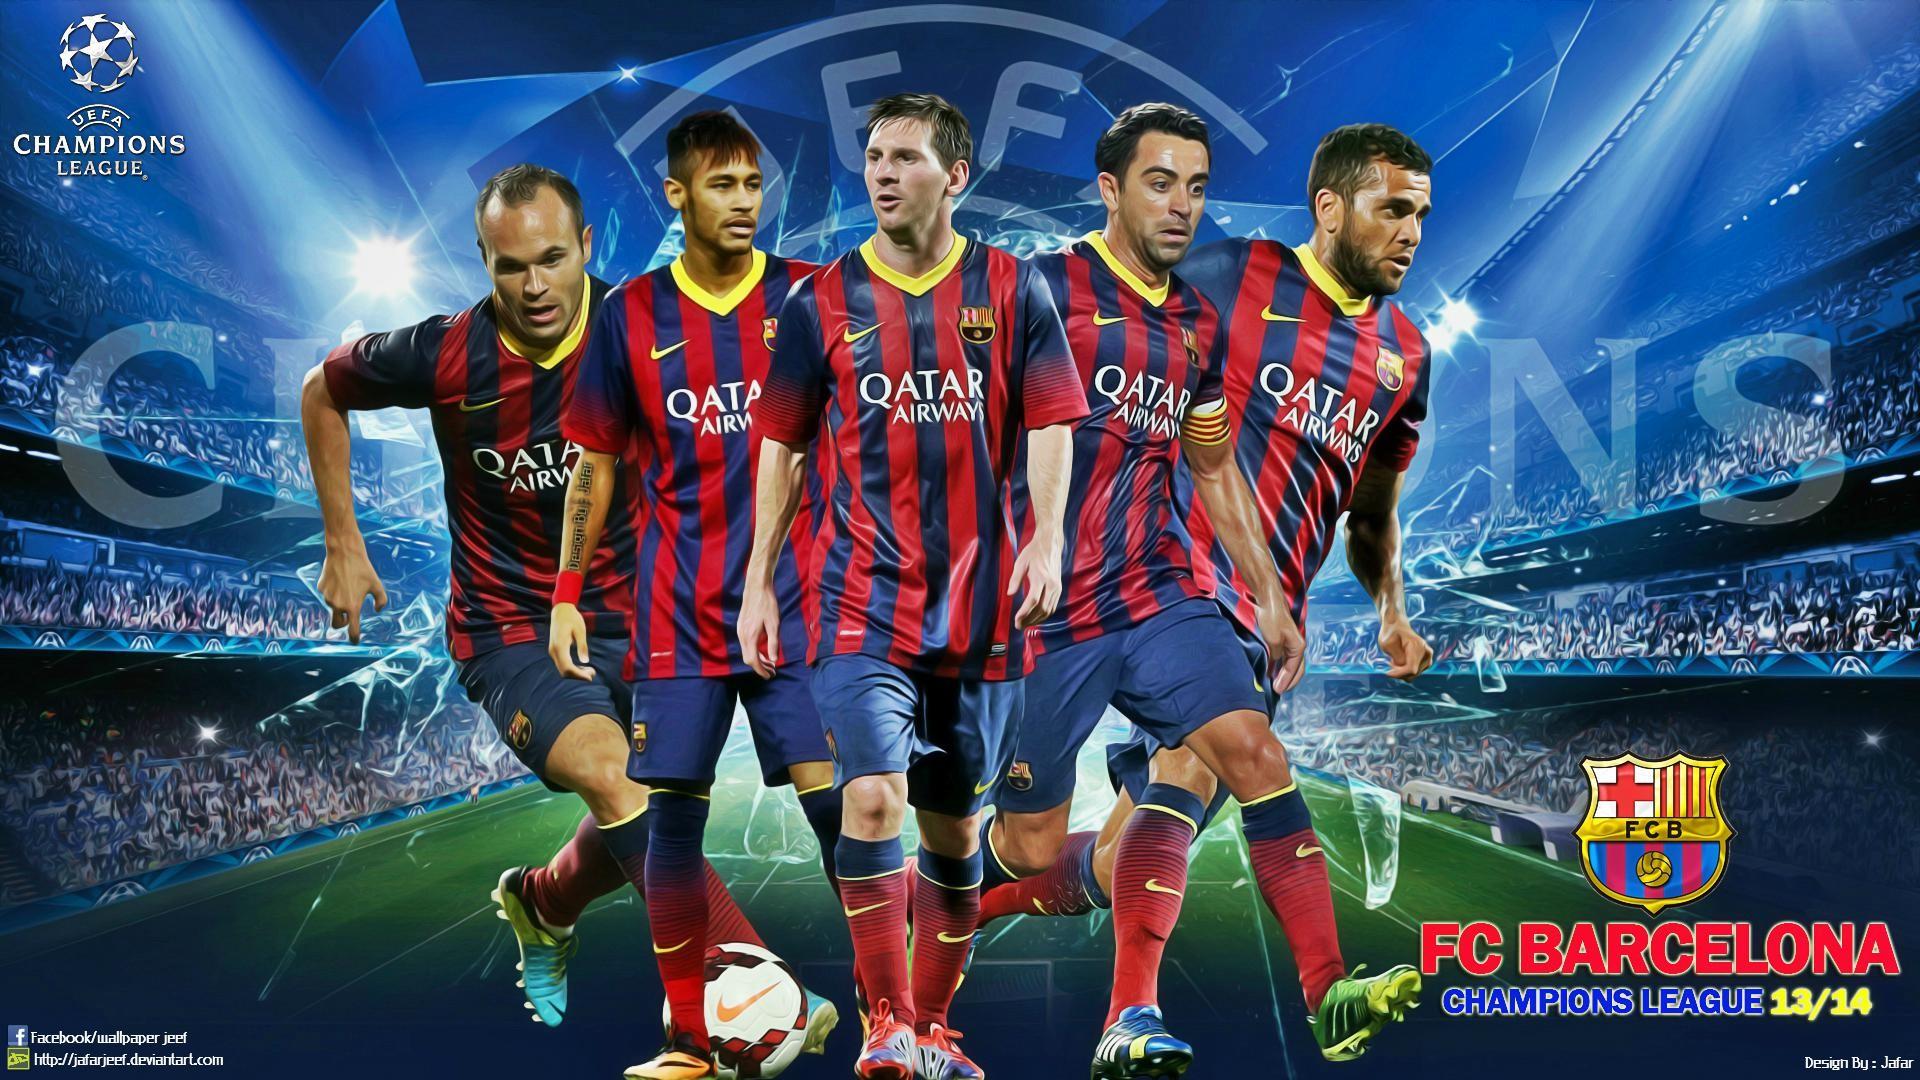 FC Barcelona Wallpaper HD 2015 – WallpaperSafari